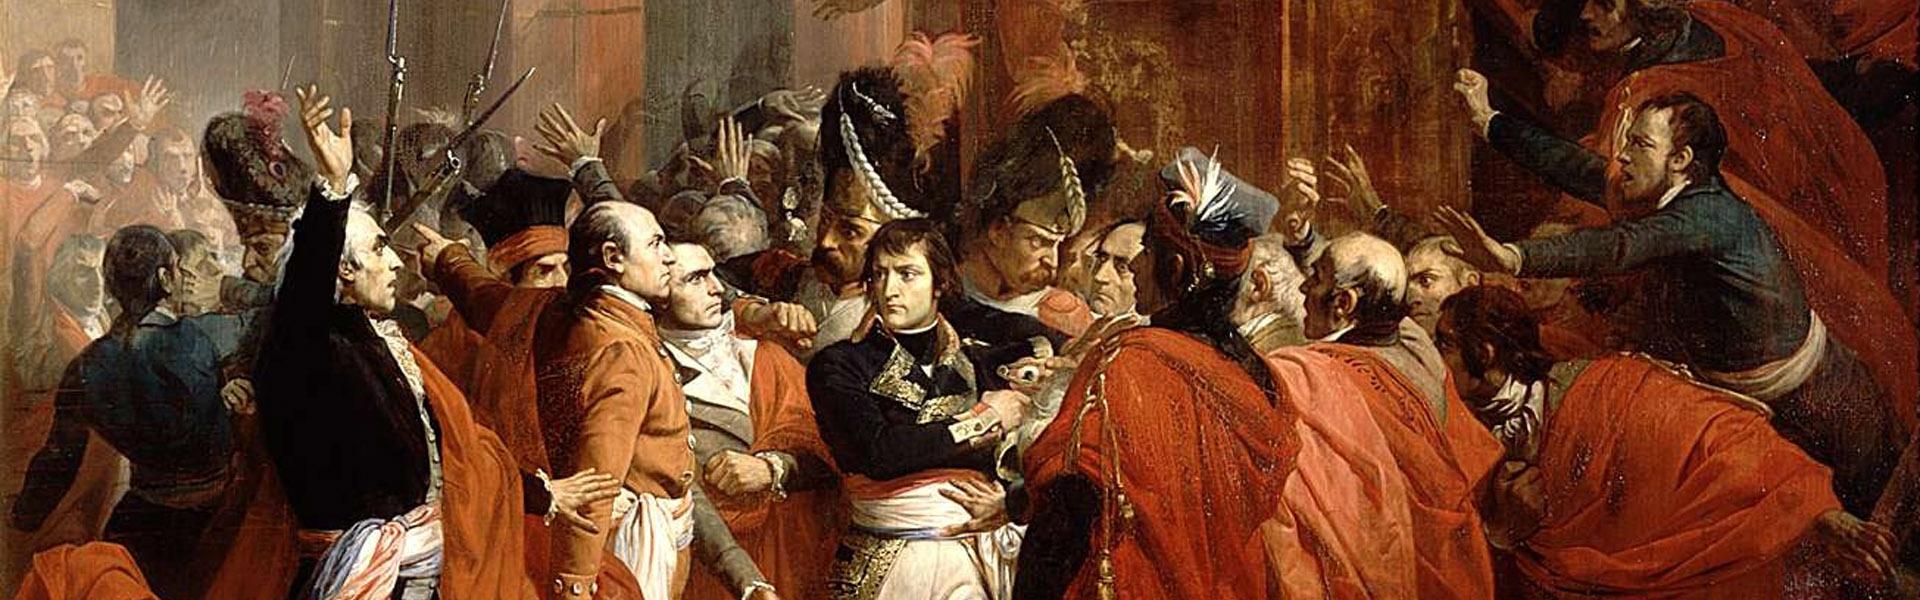 Napoleon Wallpaper 1920x600 2152